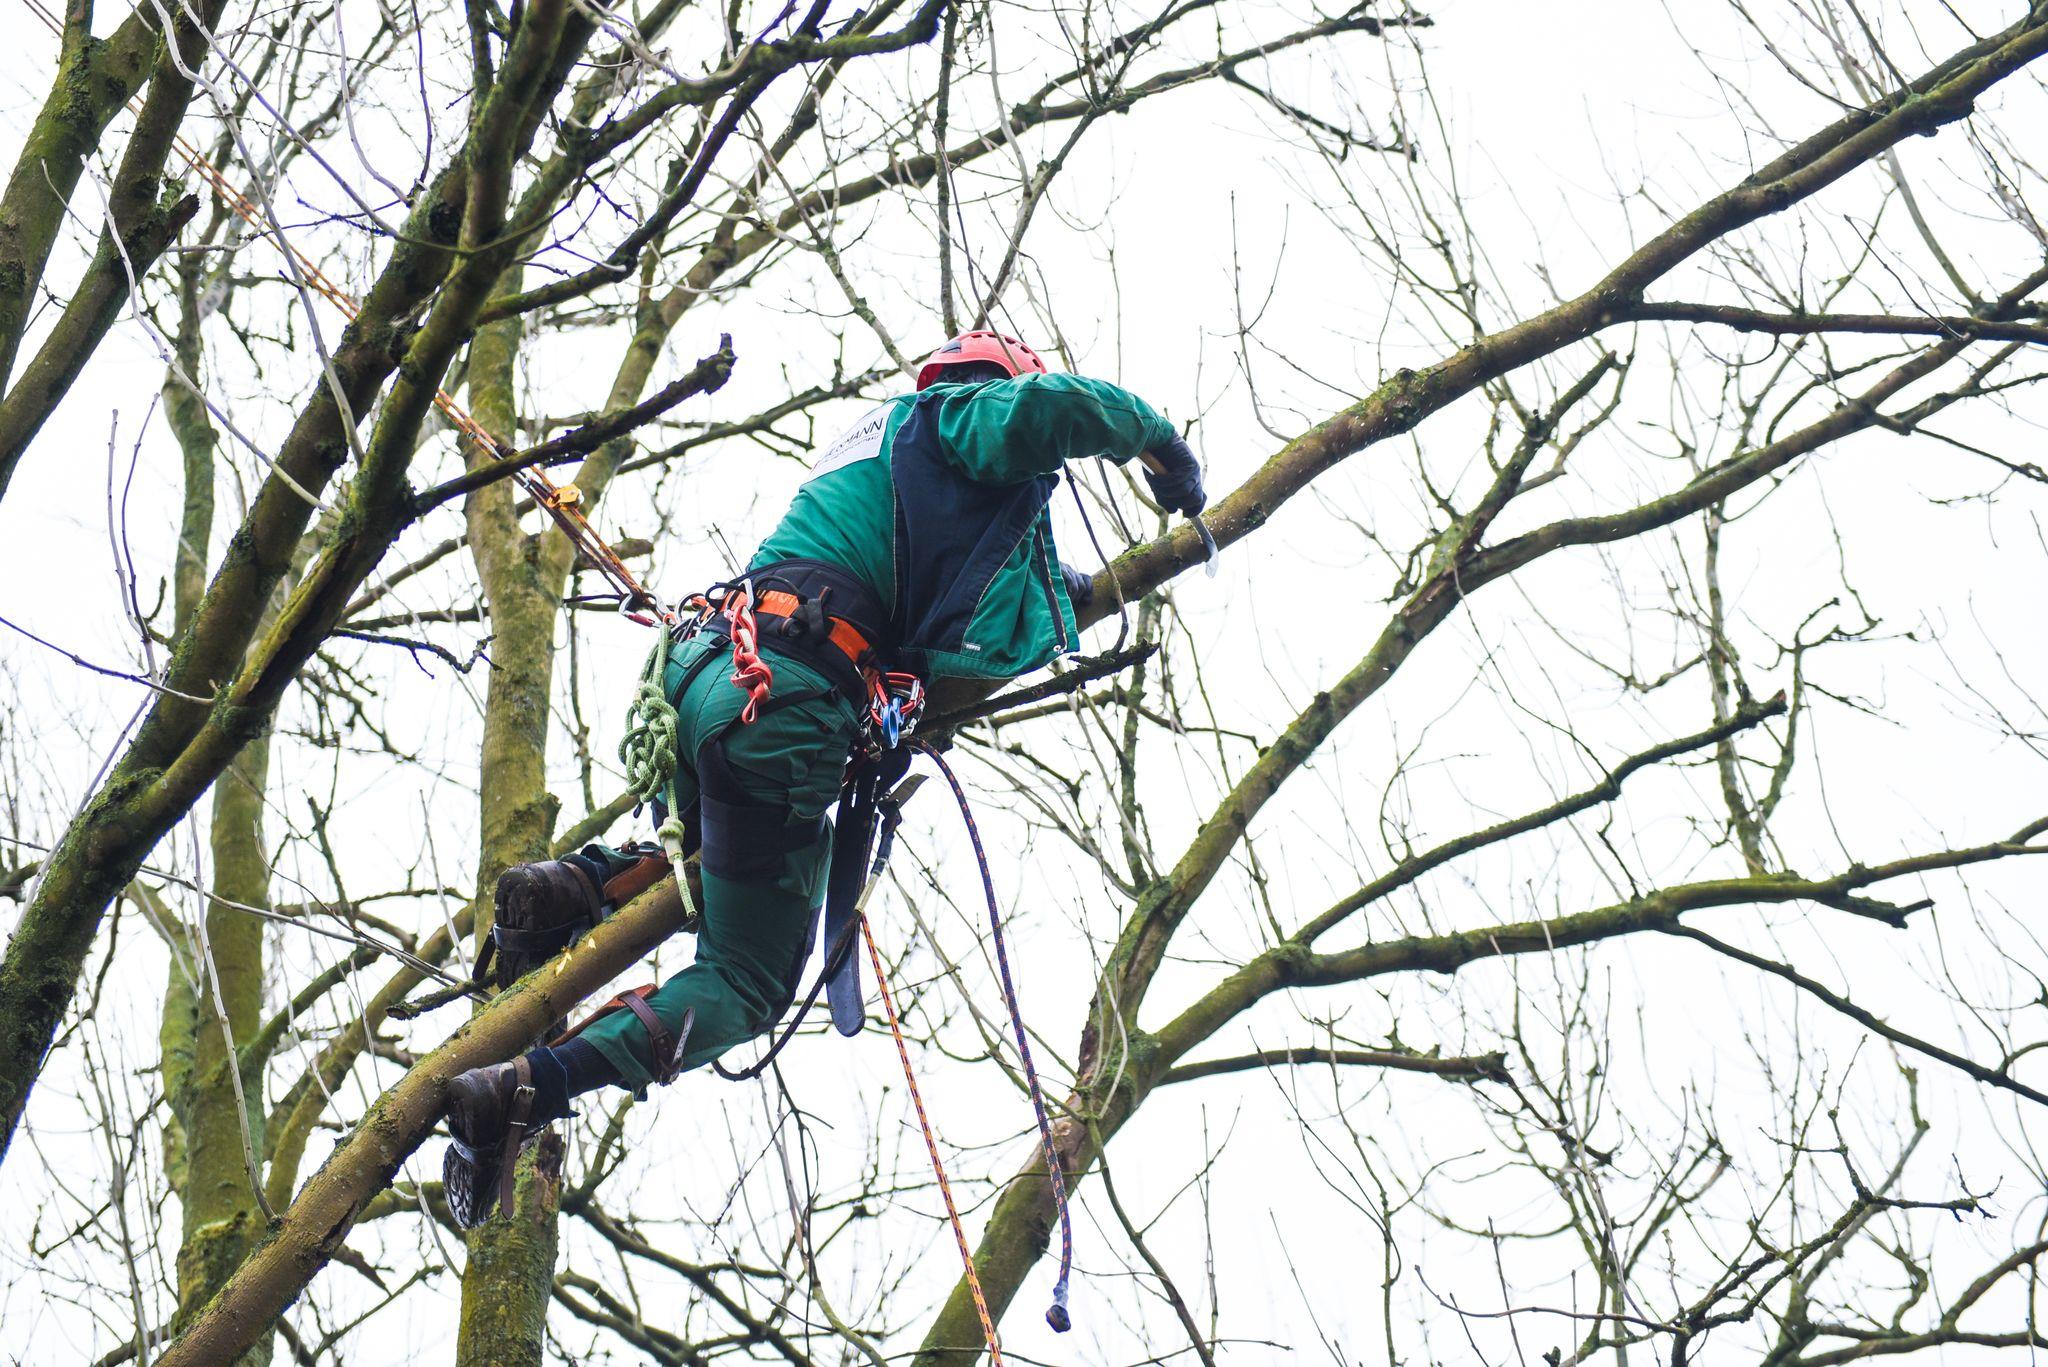 Gärtner beim Baumschnitt